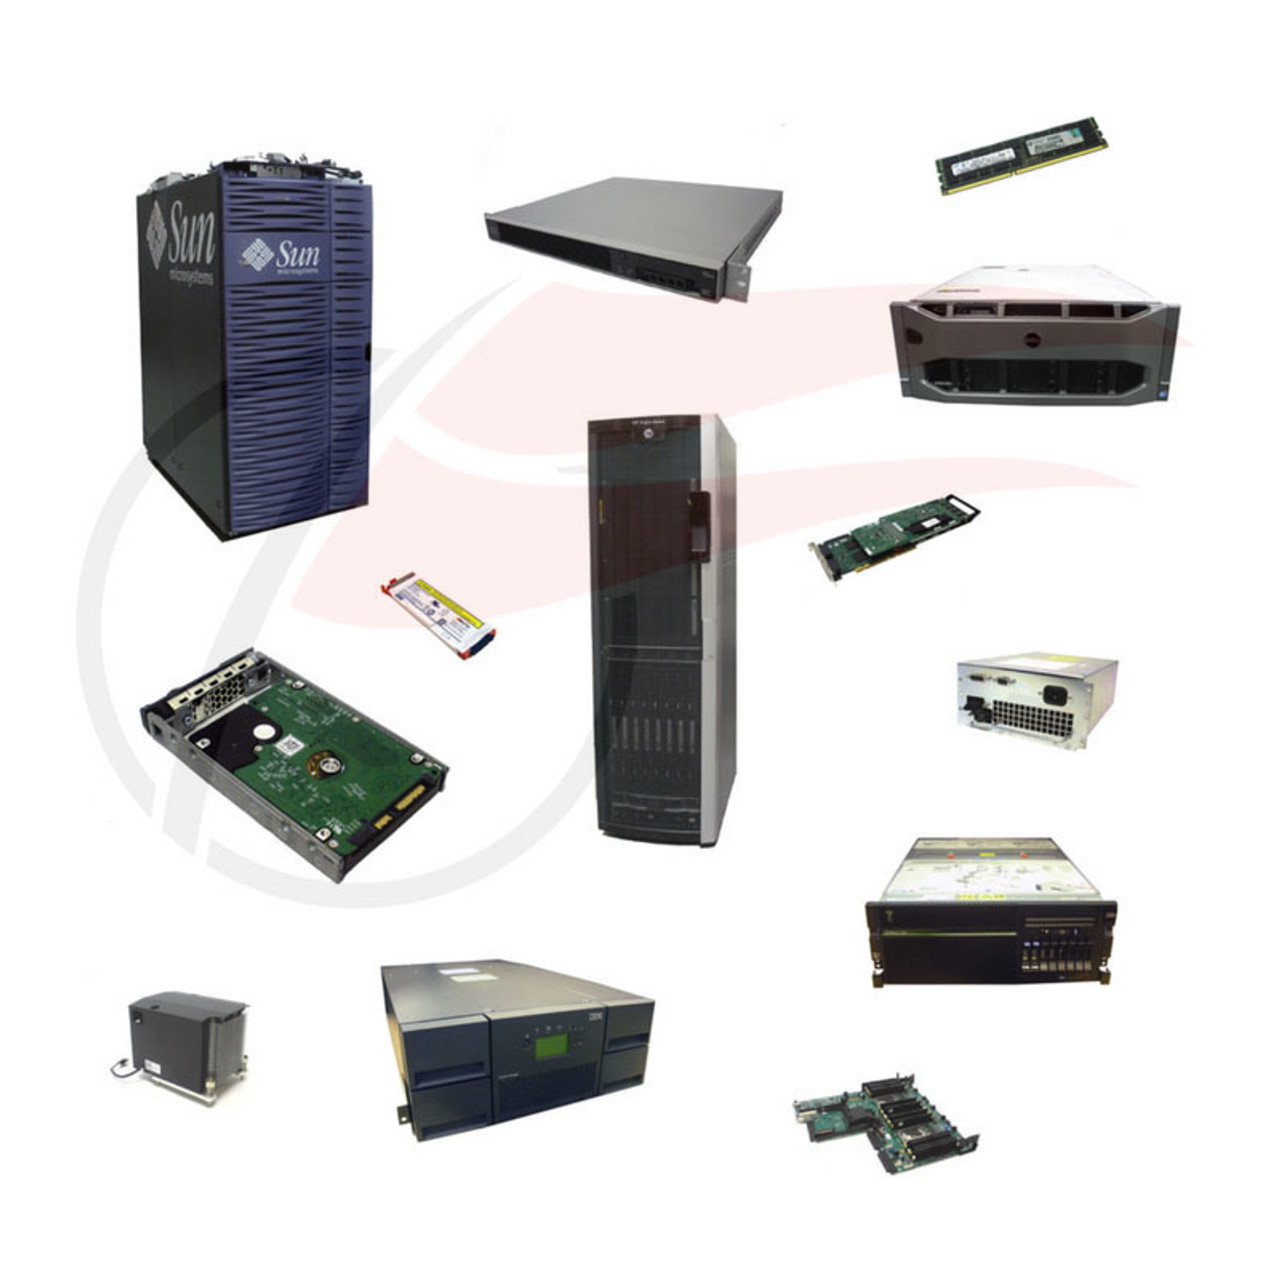 Dell PowerEdge 6850 Spare Parts